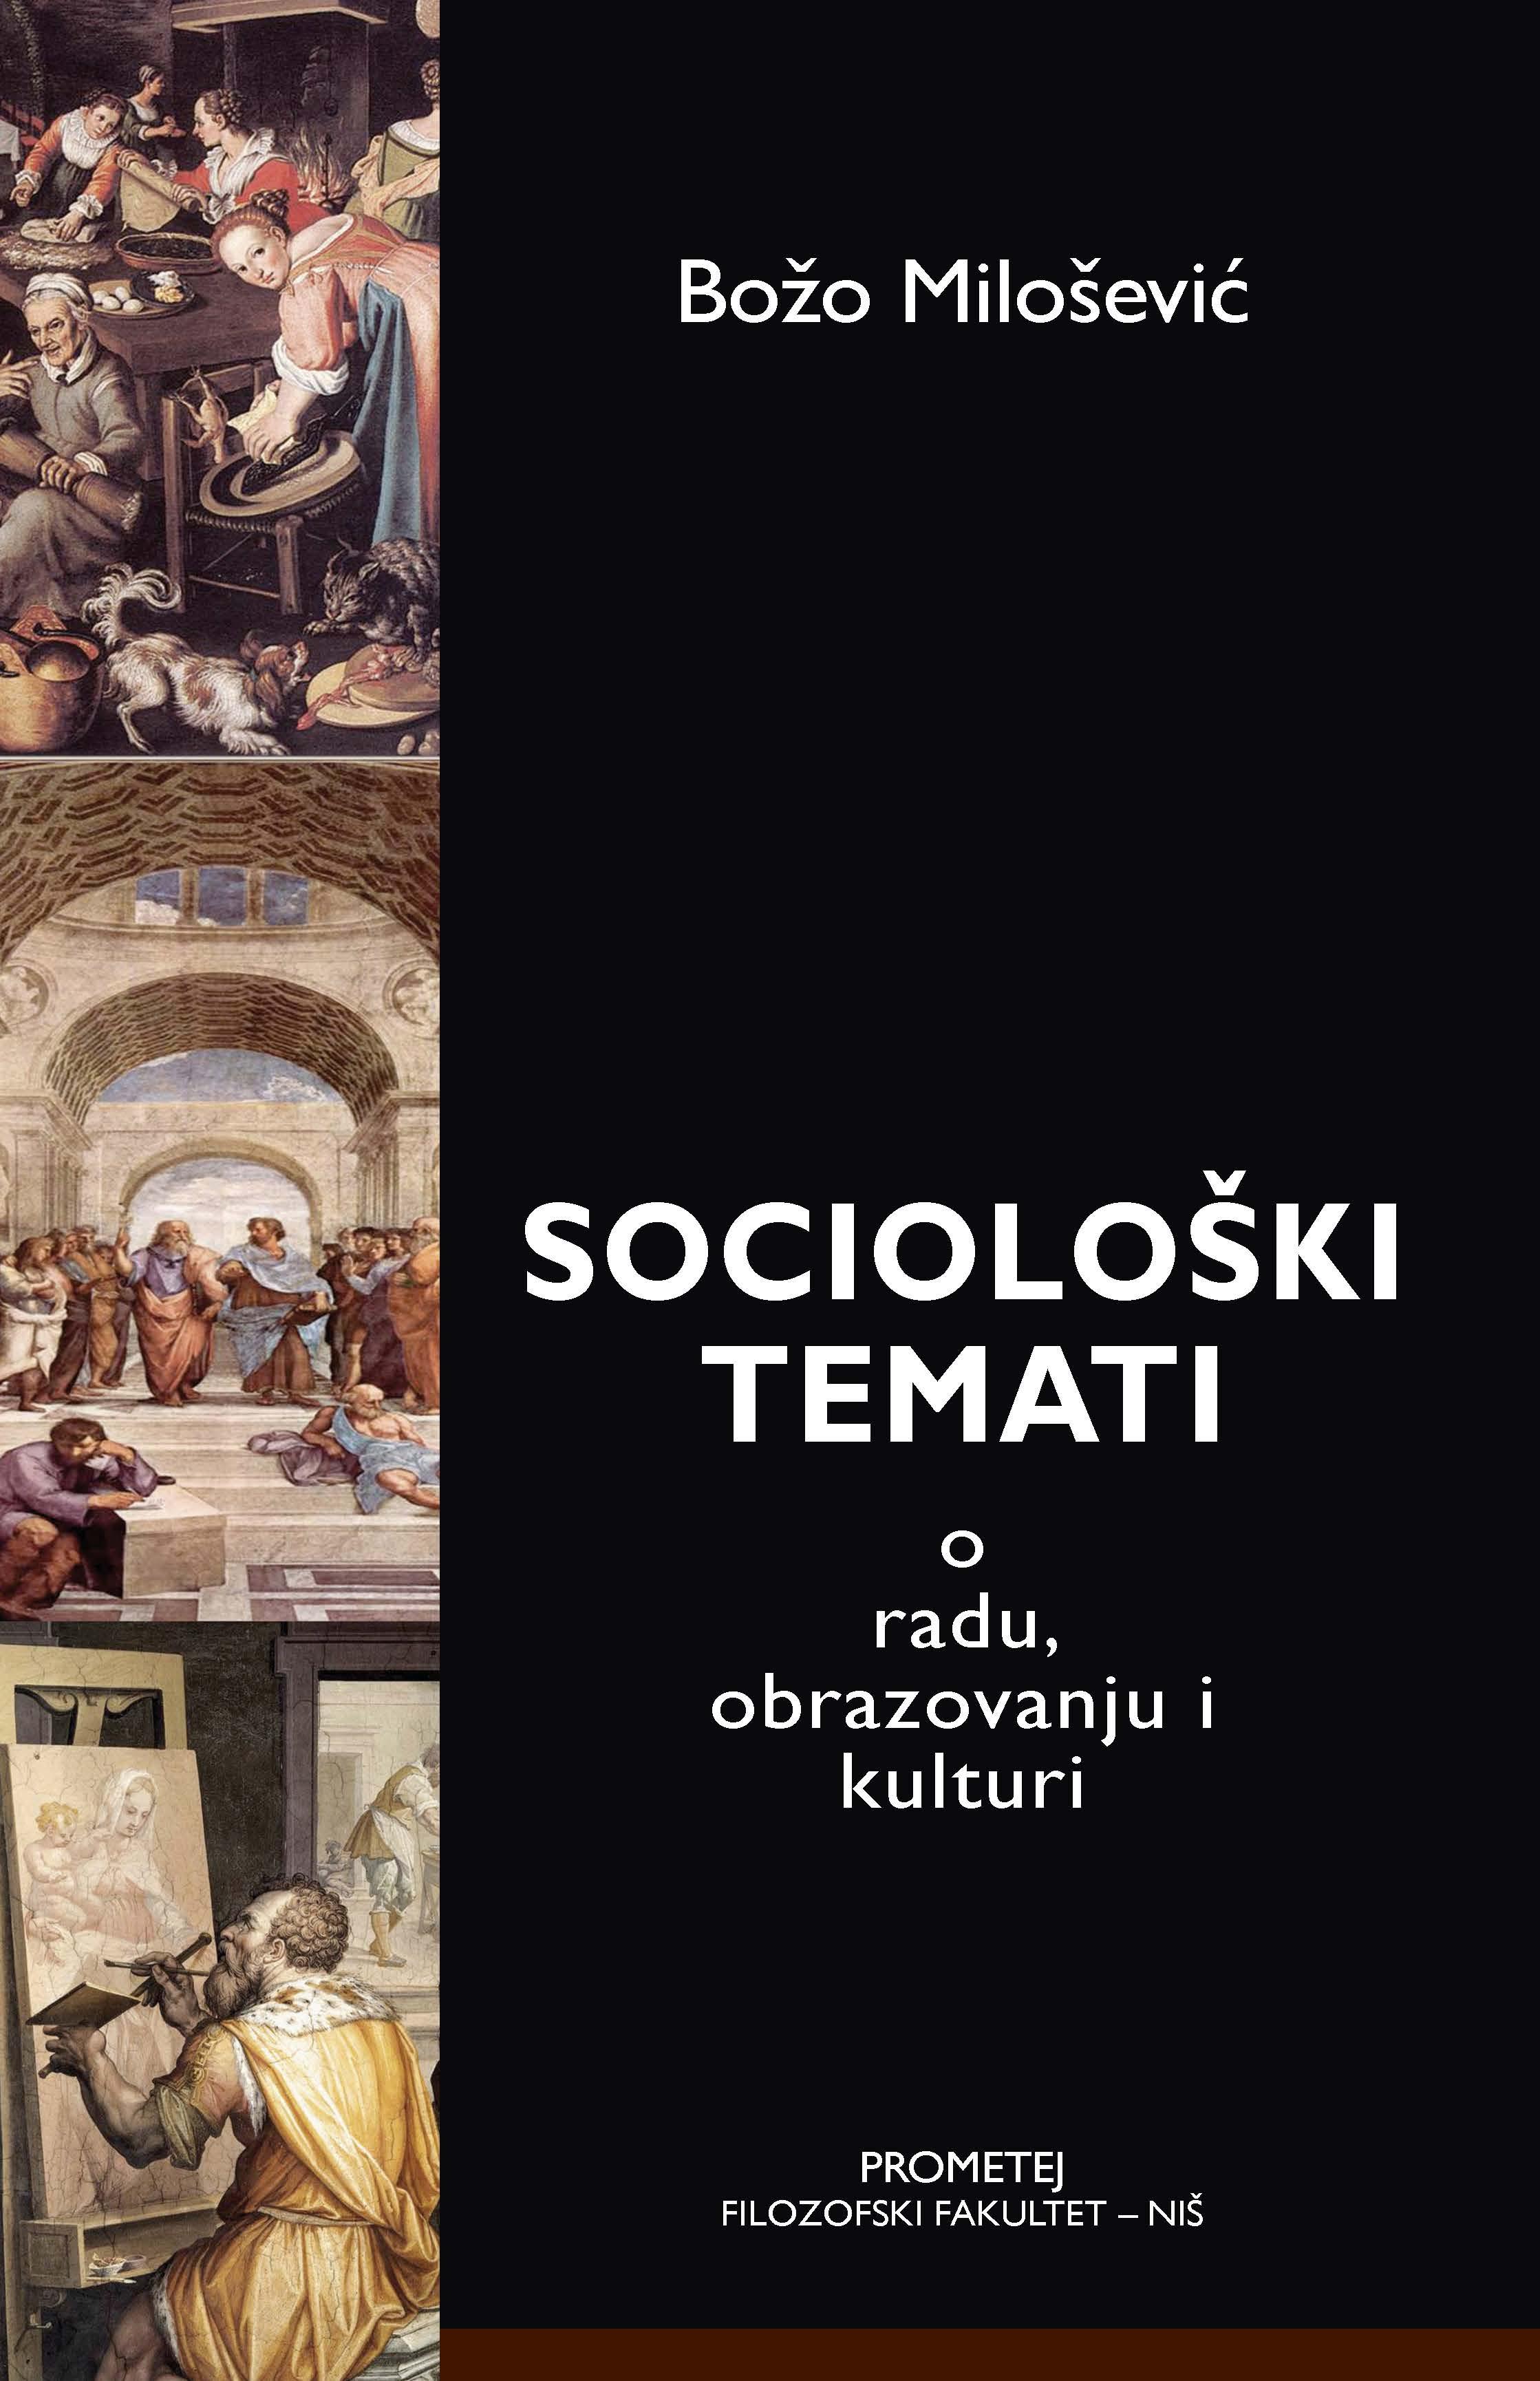 Sociološki temati